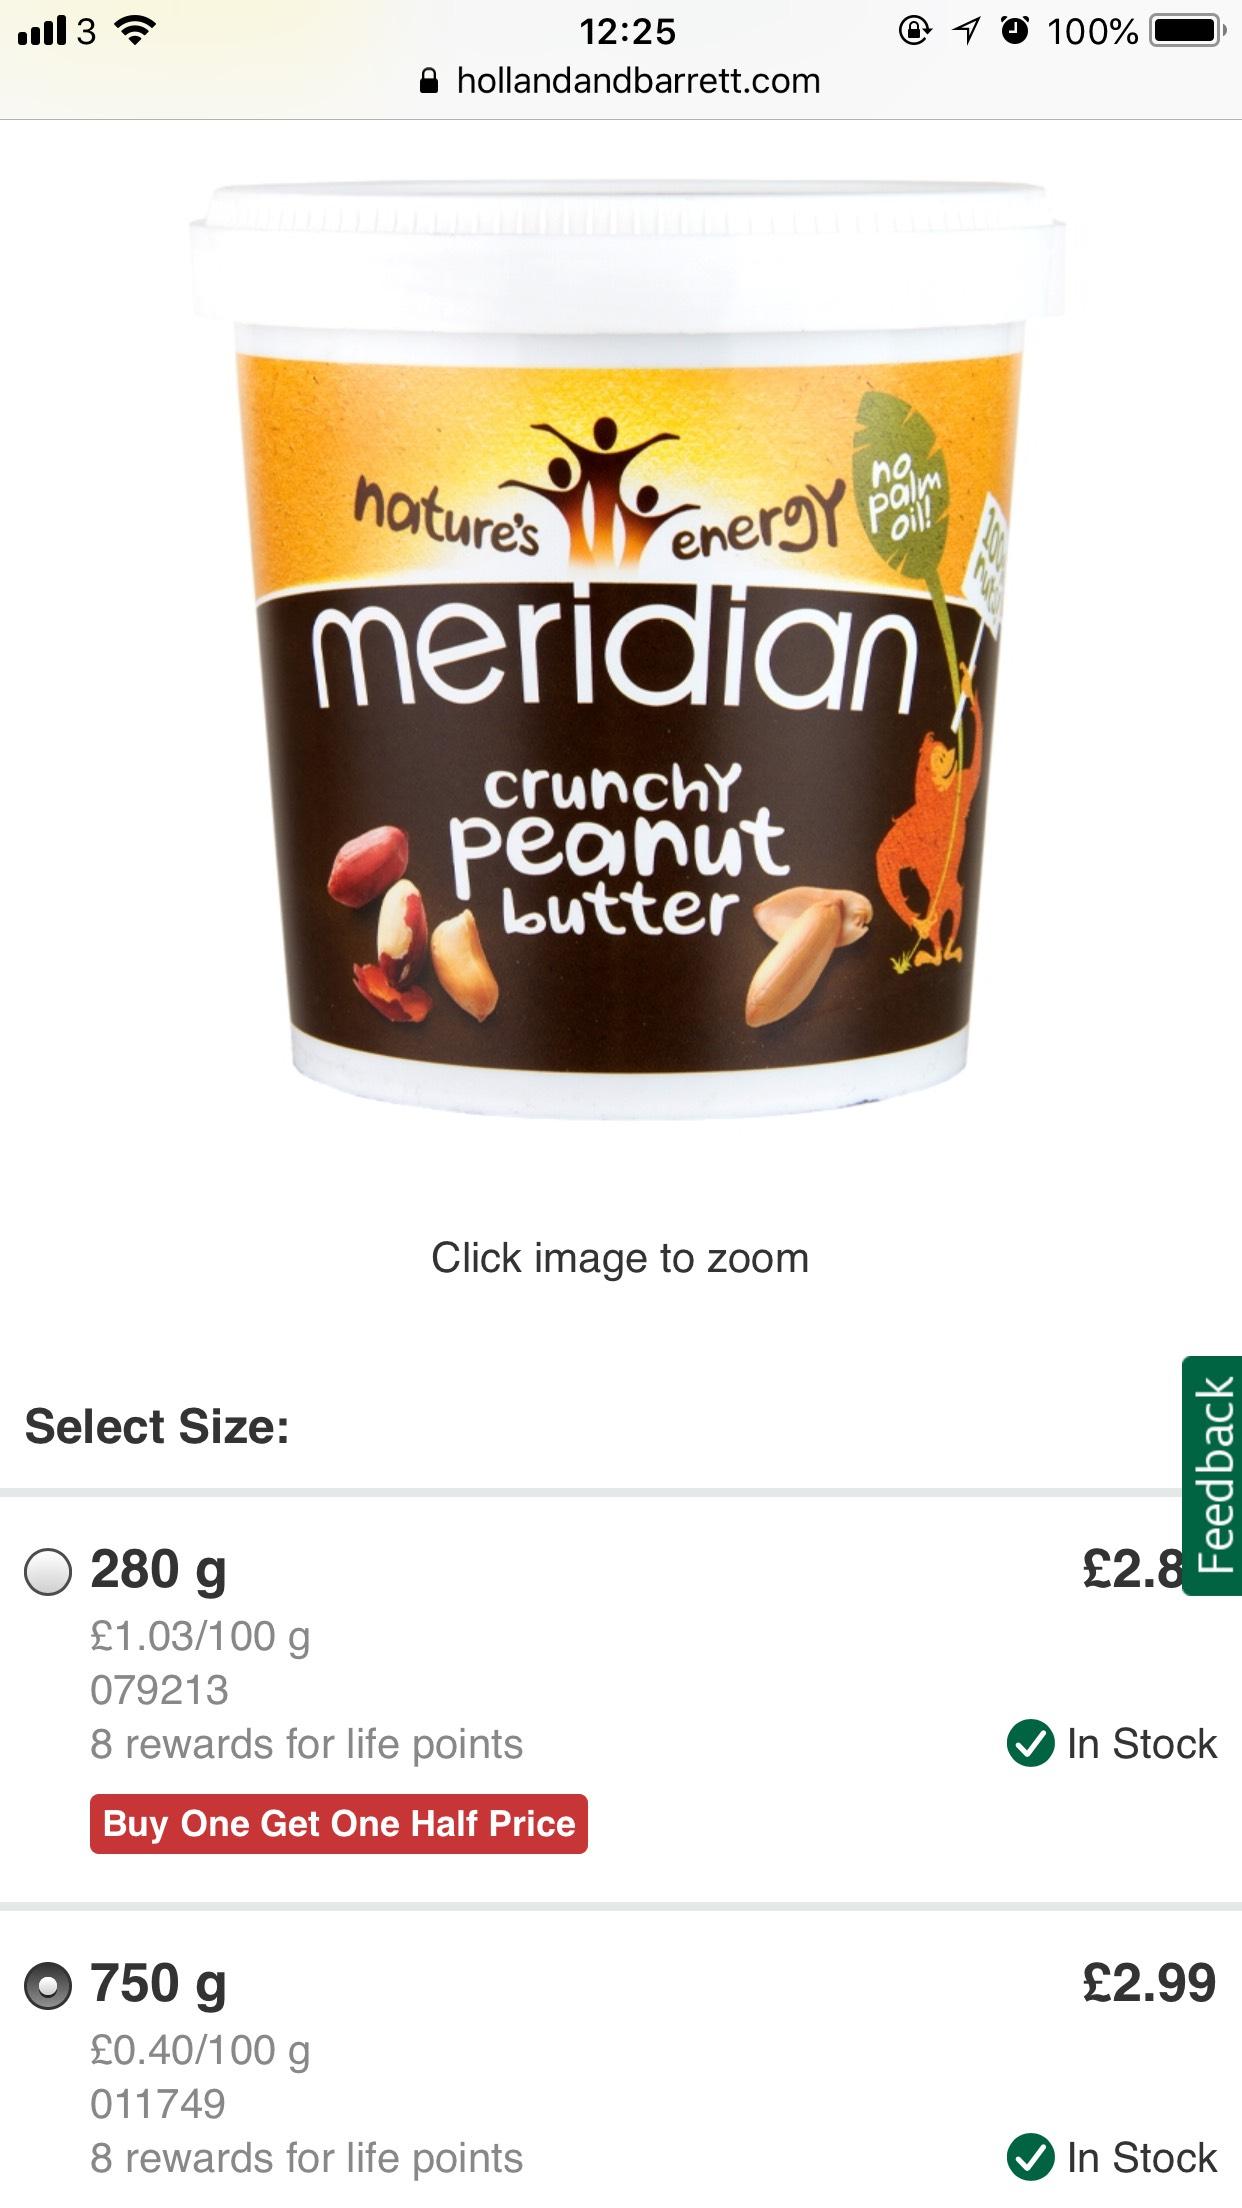 Meridian peanut butter 750g £2.39 at Holland and Barrett